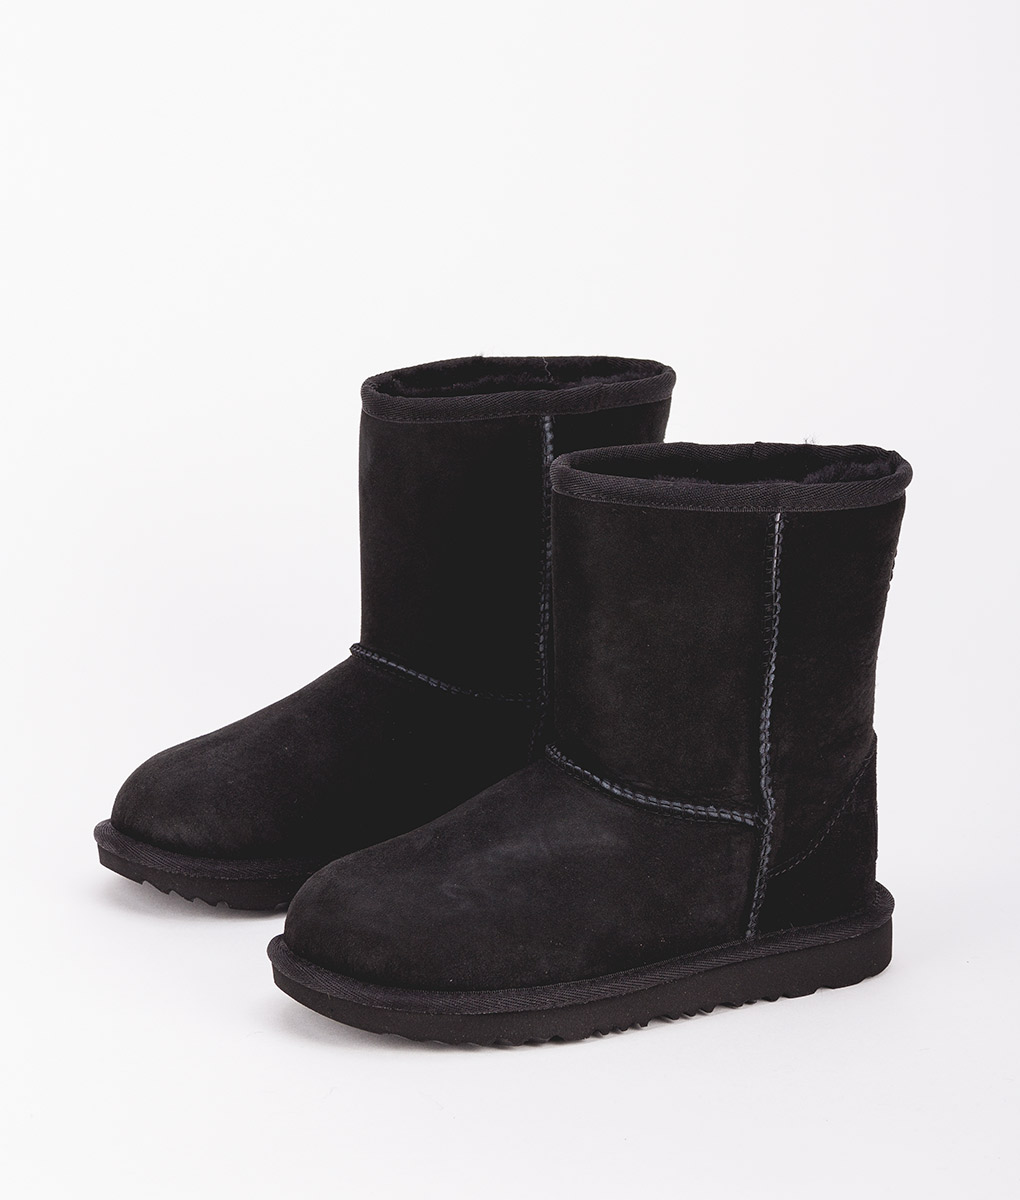 UGG Kids Ankle Boots 1017703K CLASSIC II, Black 2